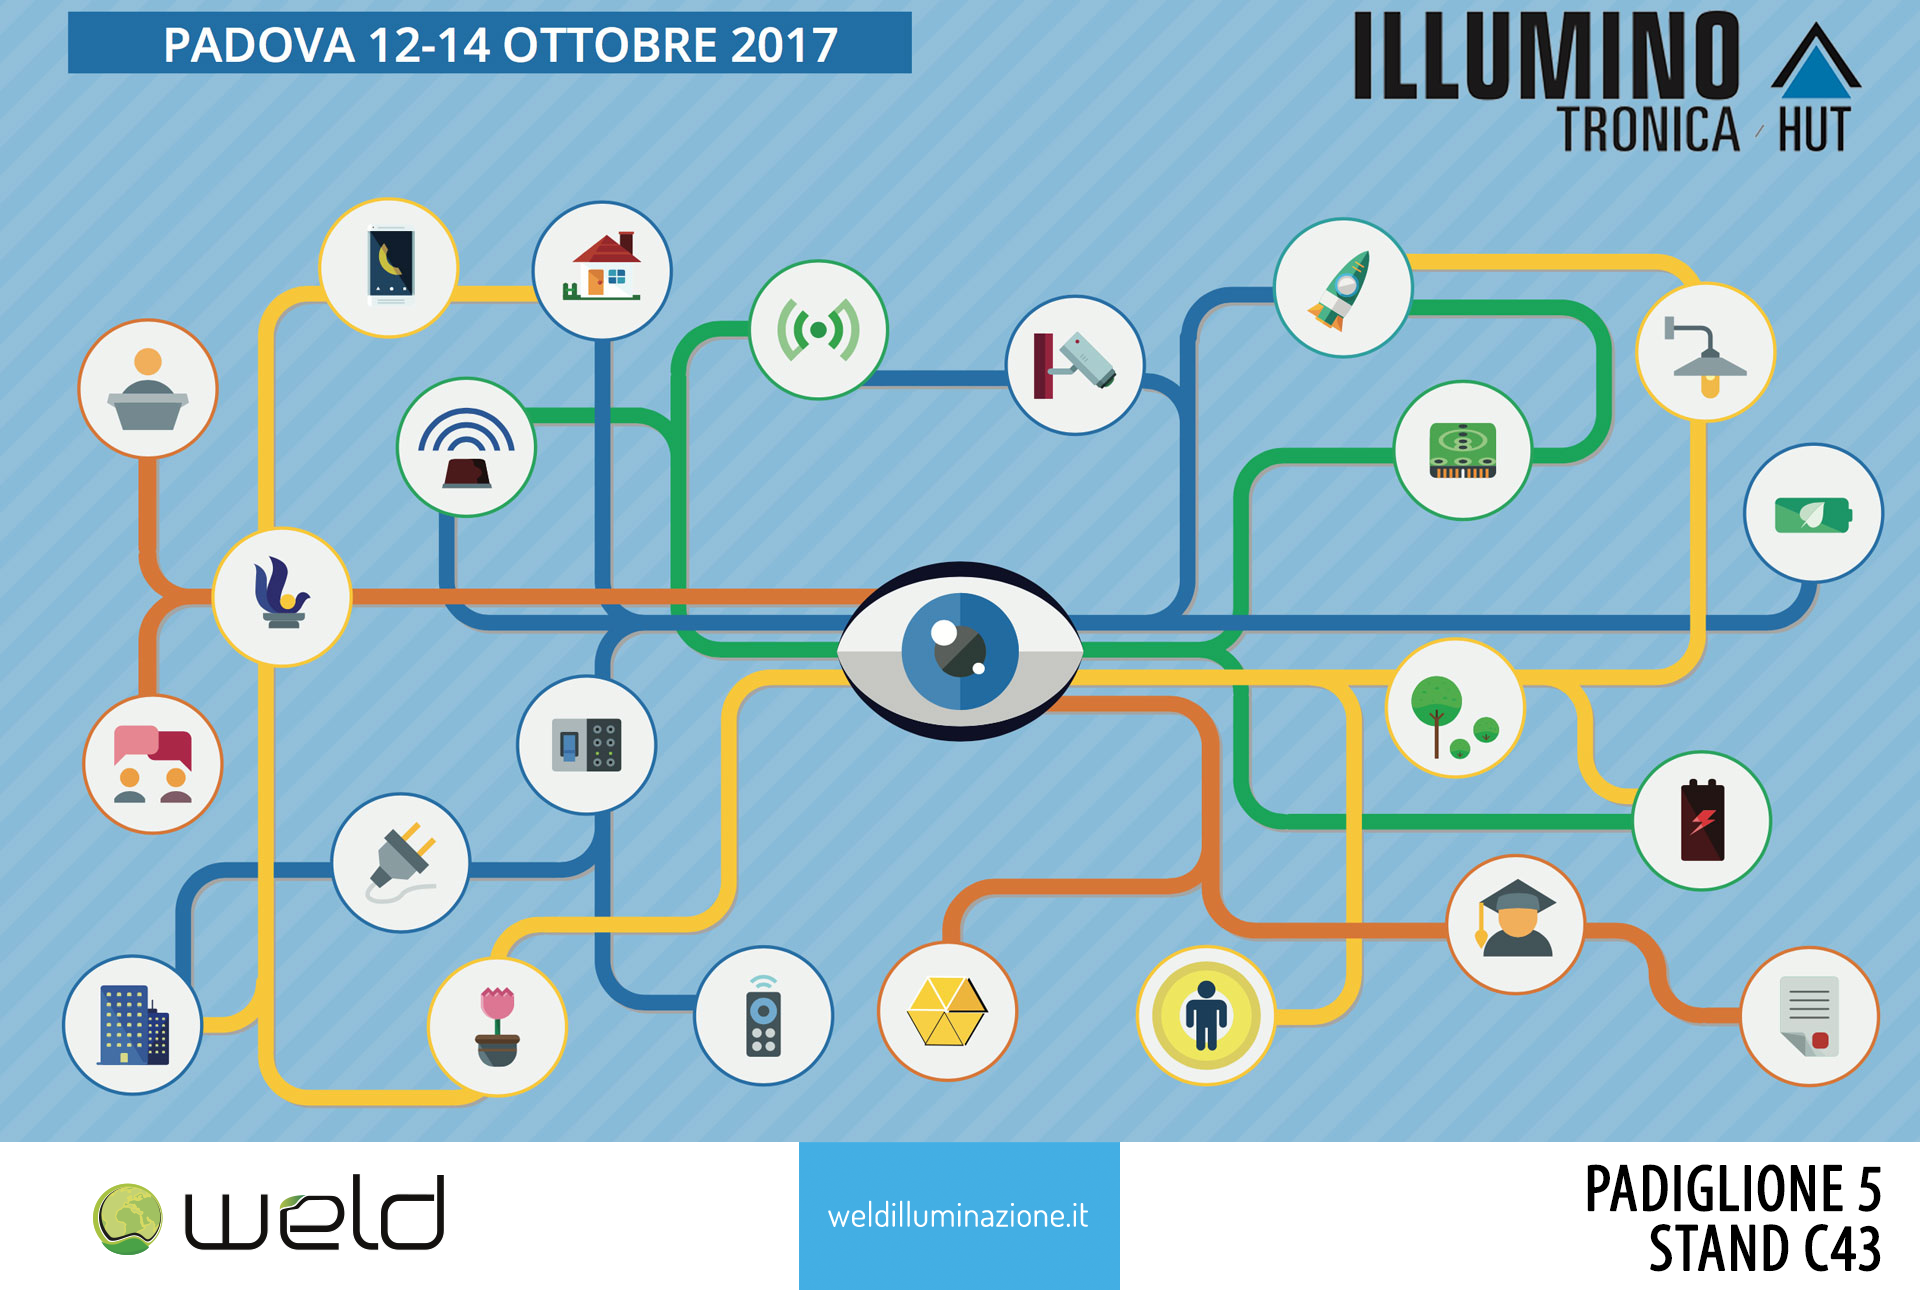 Weld a Illuminotronica | Padova | 12-14 Ottobre